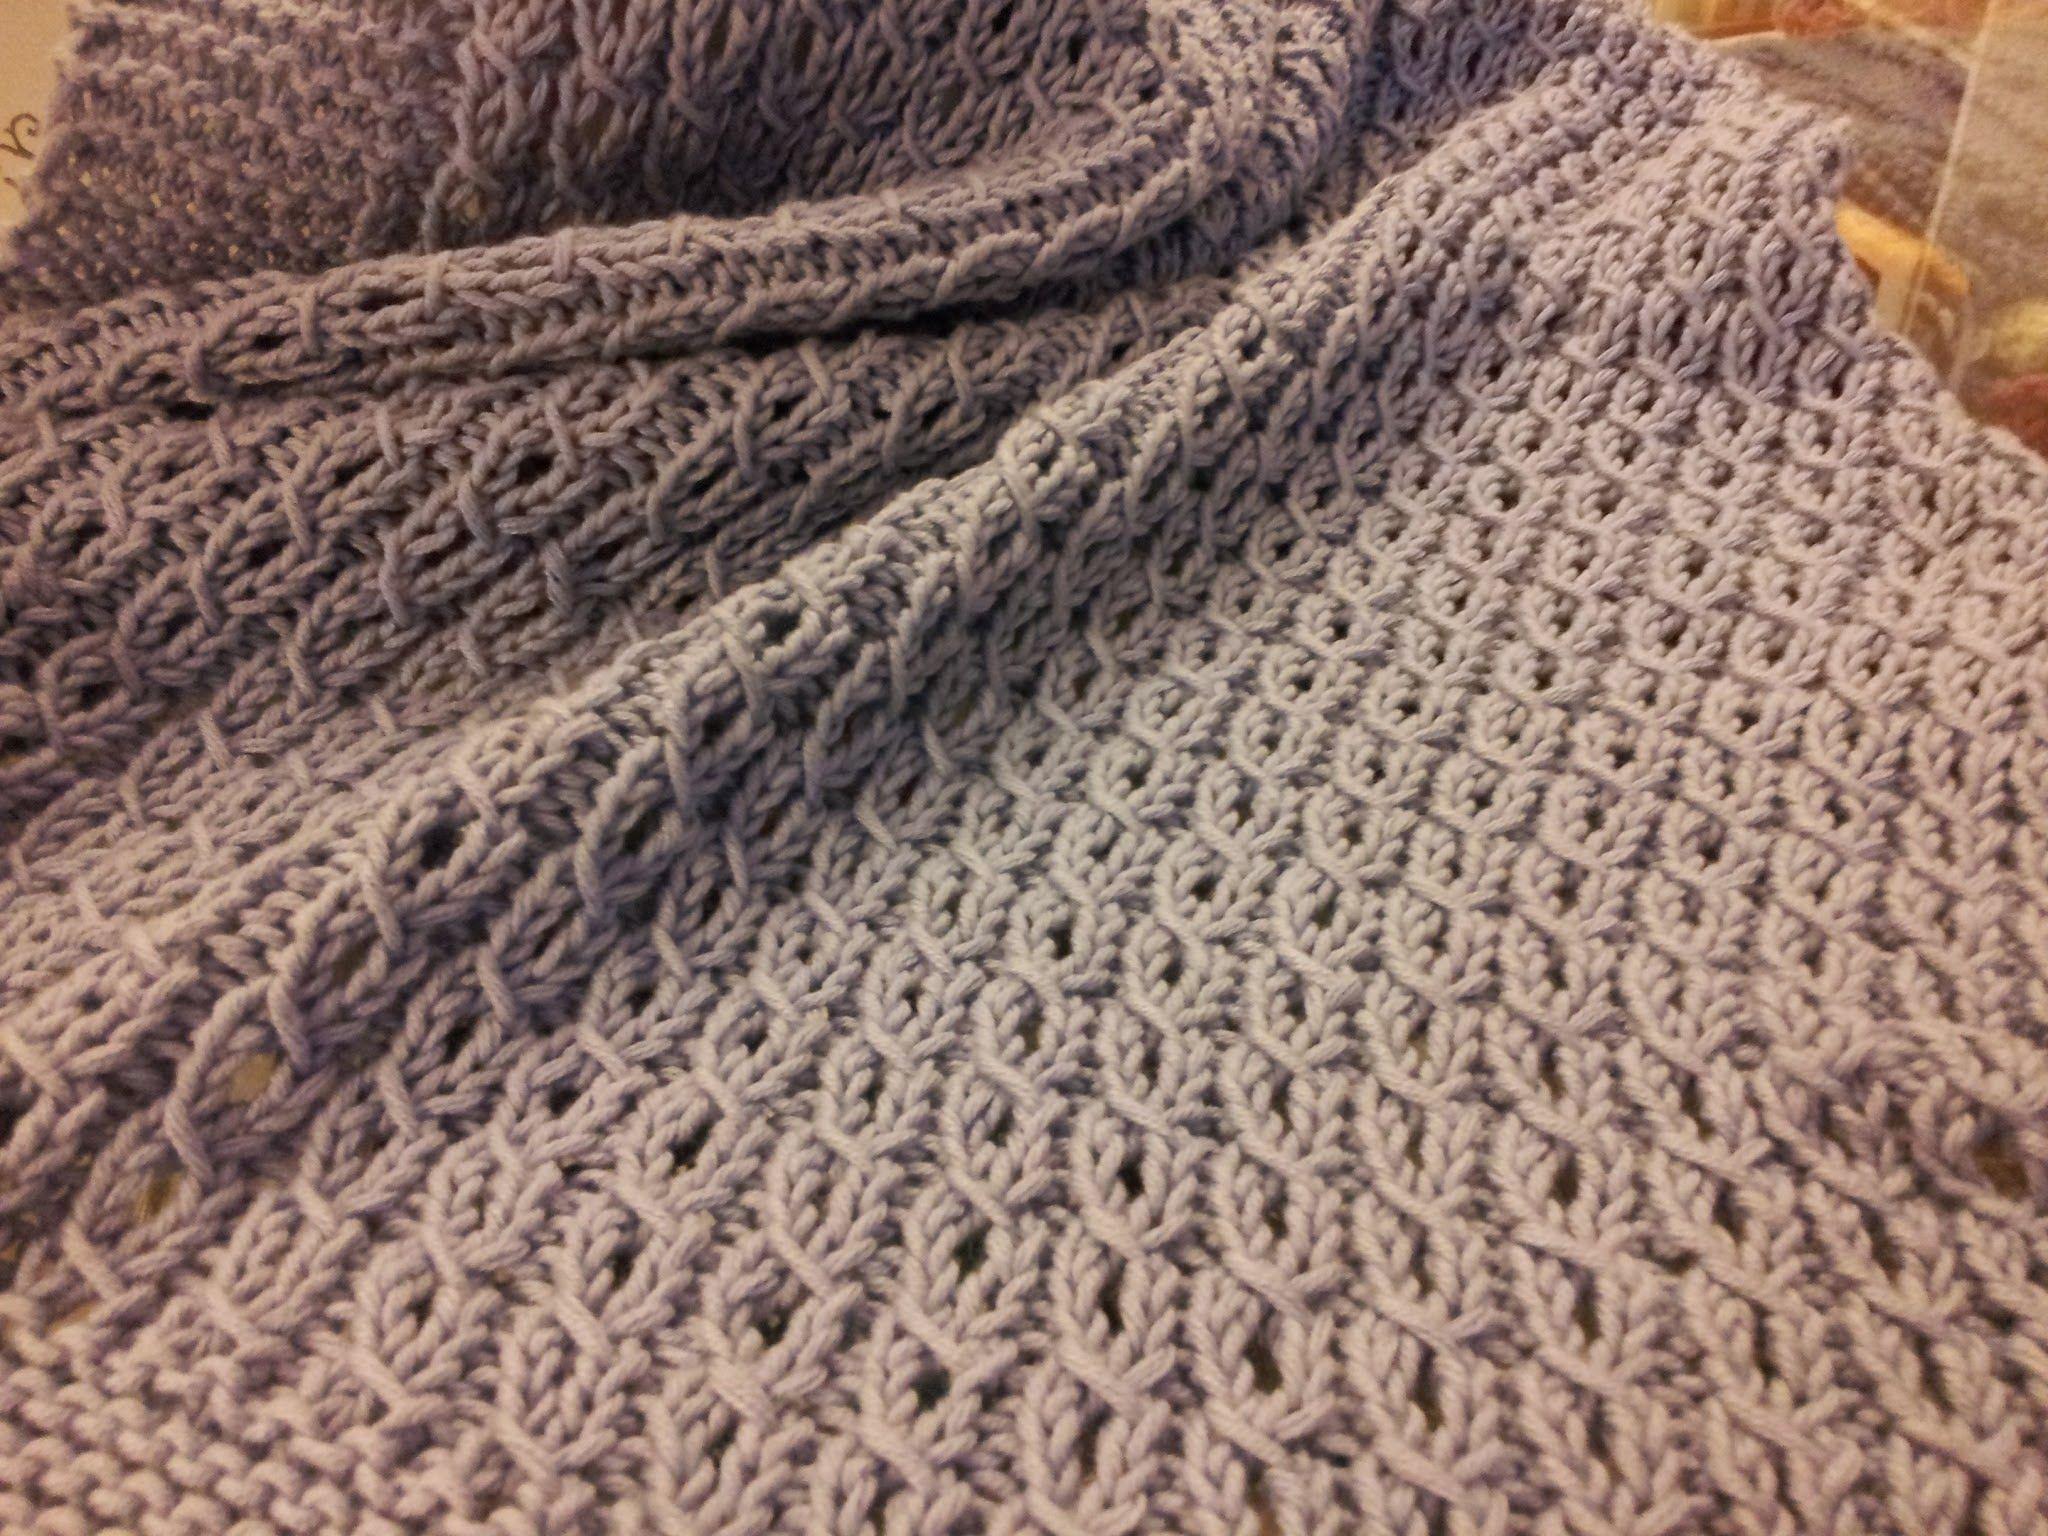 Materiales lana para agujas del n 4 en algod n o lana - Puntos para tejer lana ...